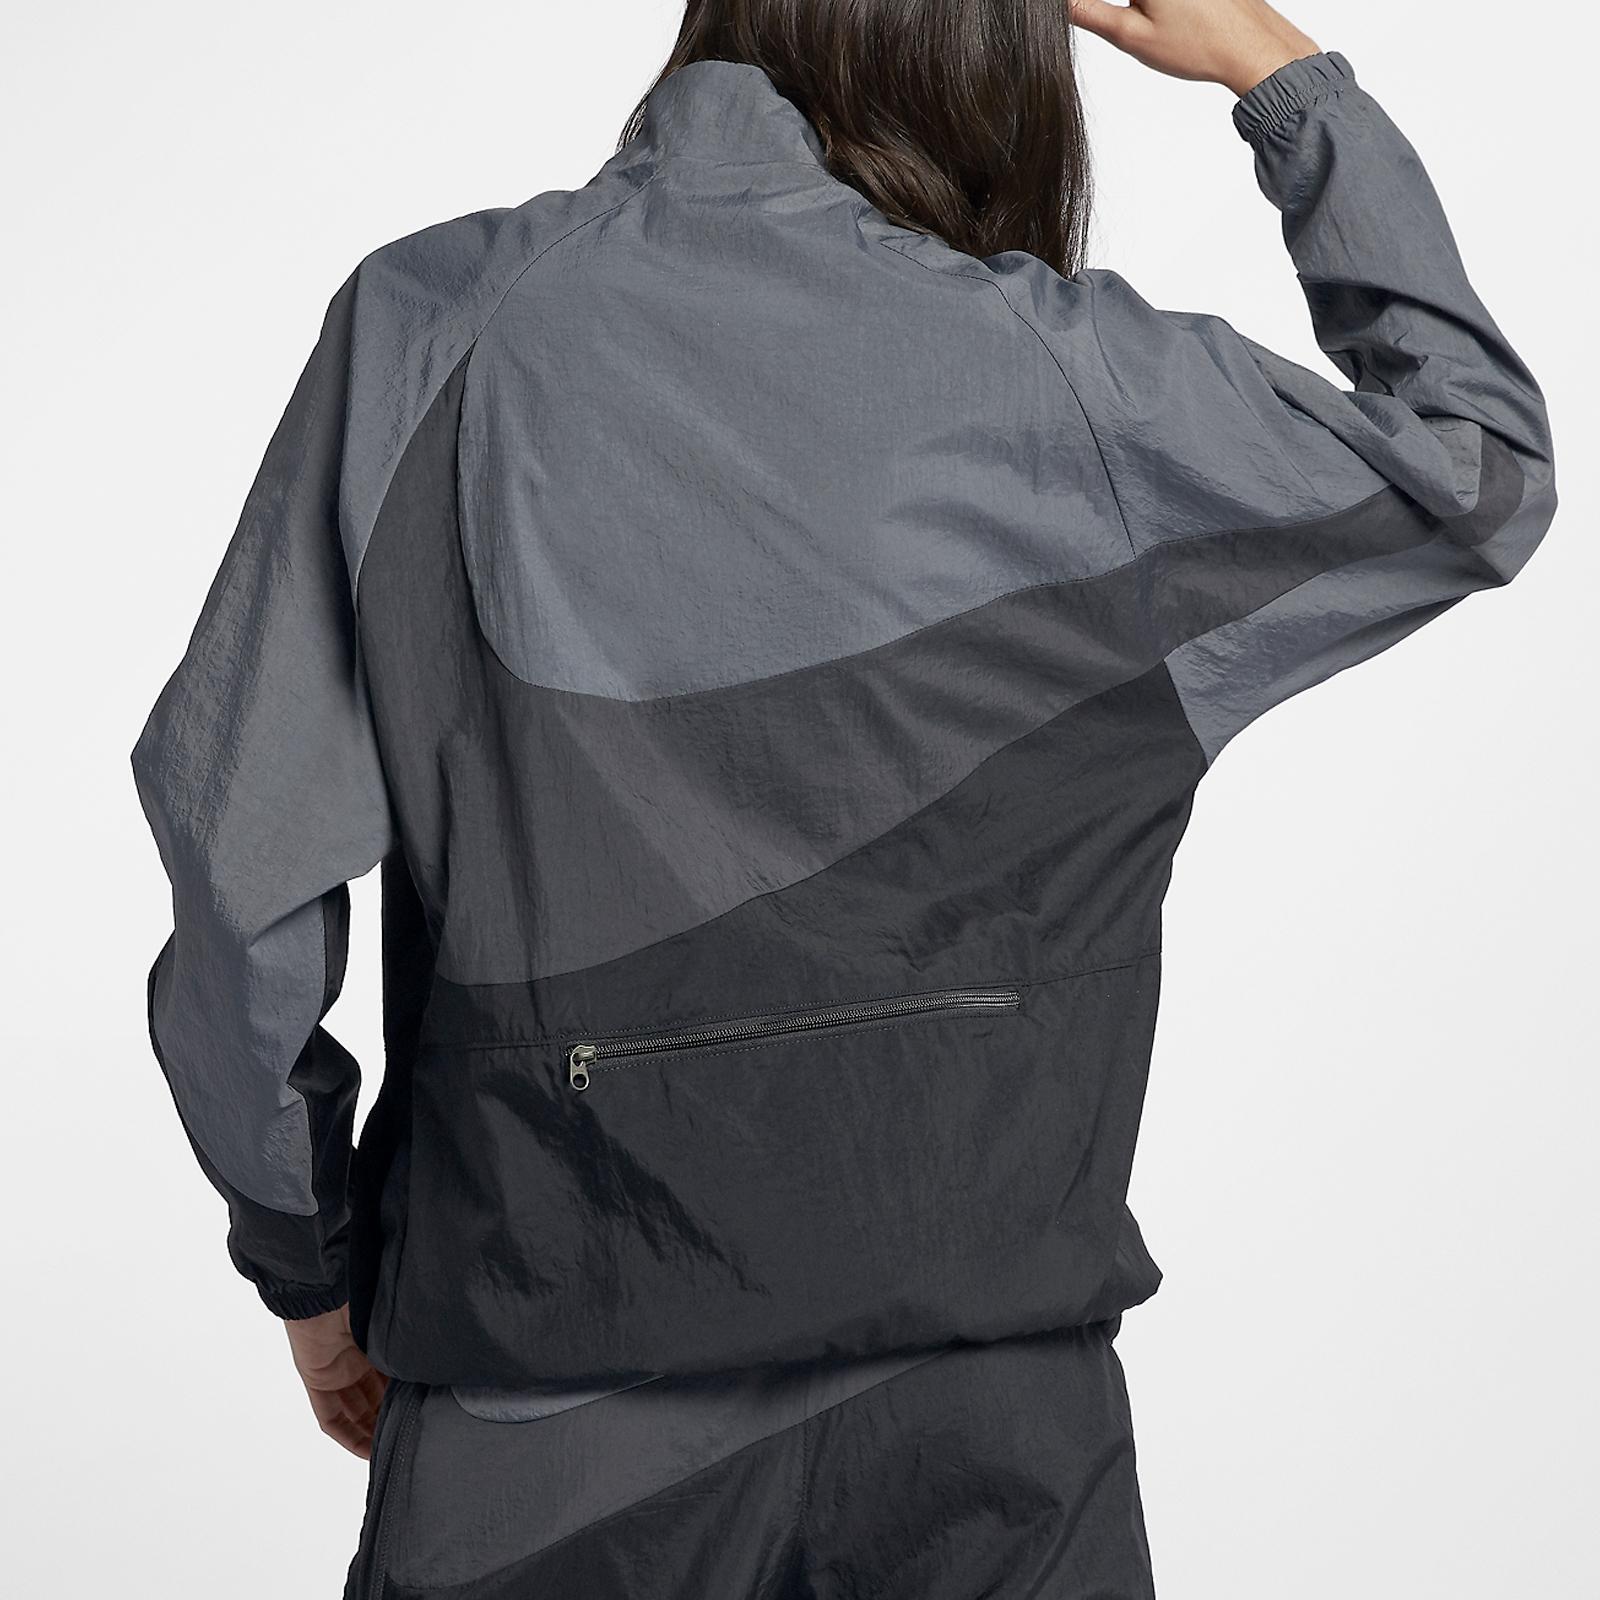 d05e25d7c694 Nike NSW Swoosh Woven Halfzip Jacket - Aj2696-011 - Sneakersnstuff ...